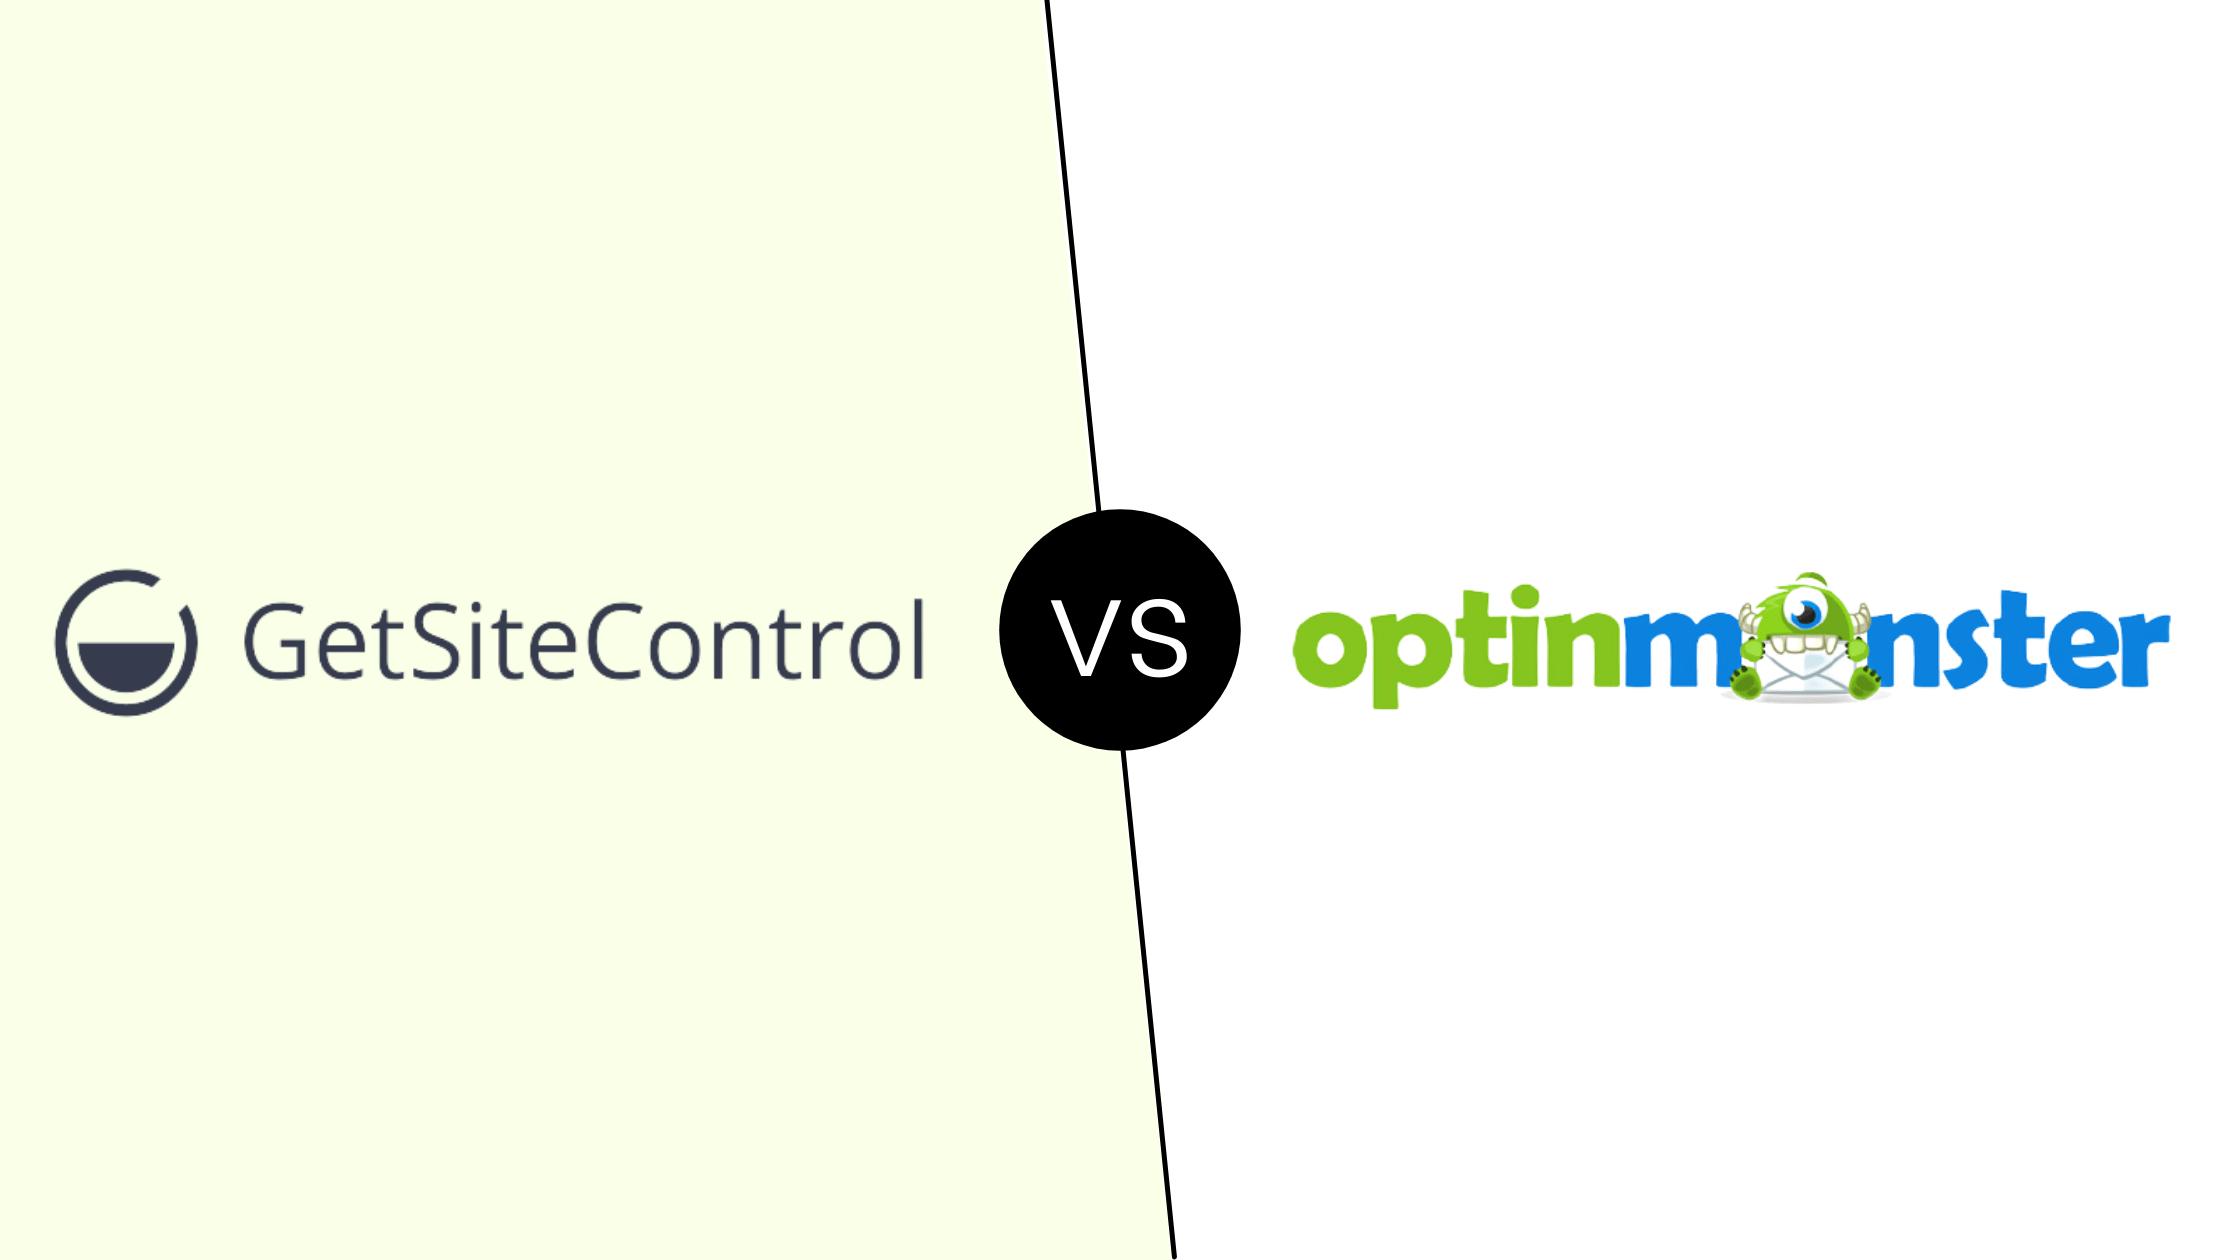 Getsitecontrol vs OptinMonster